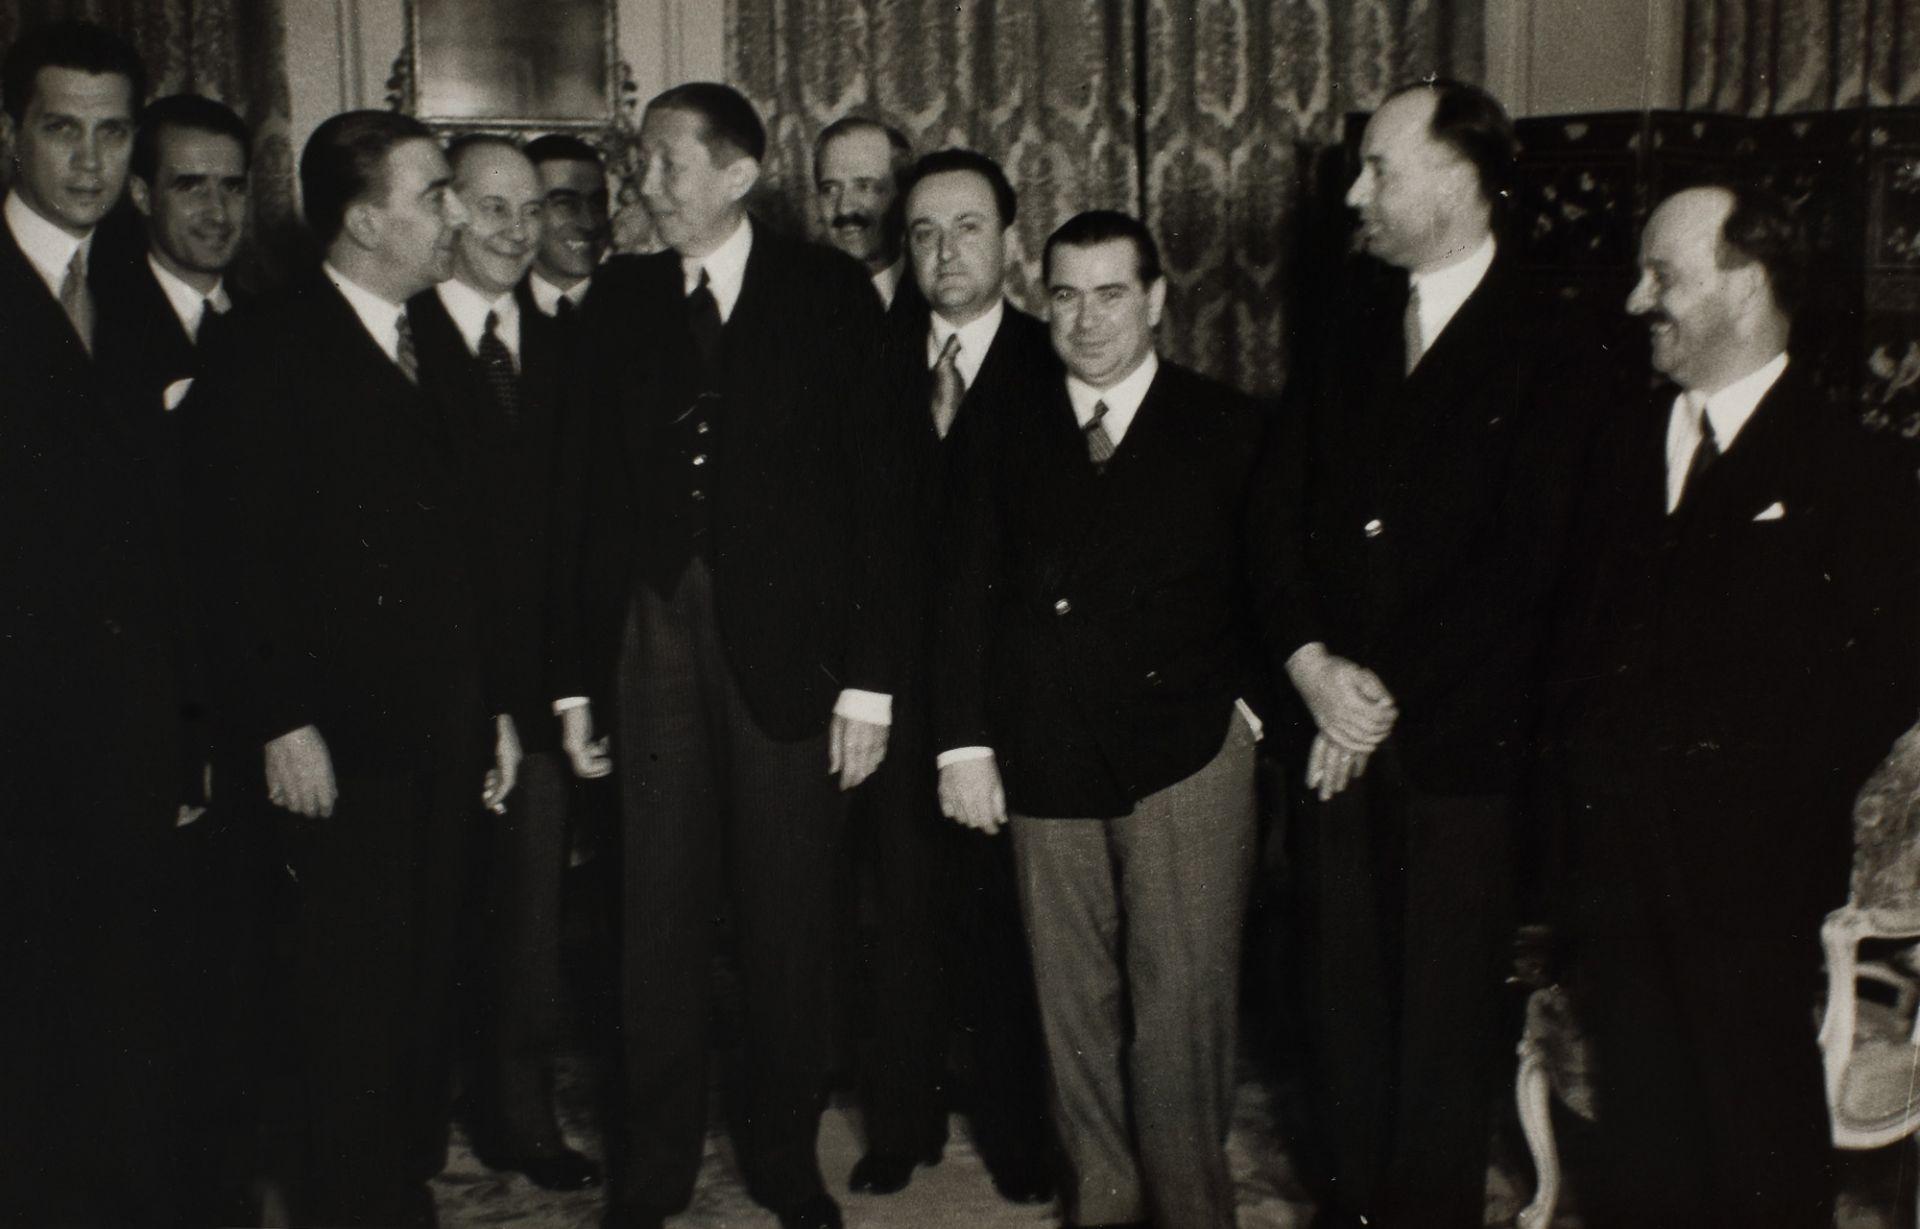 Seven photos illustrating Nicolae Titulescu, approx. 1940 - Bild 4 aus 8